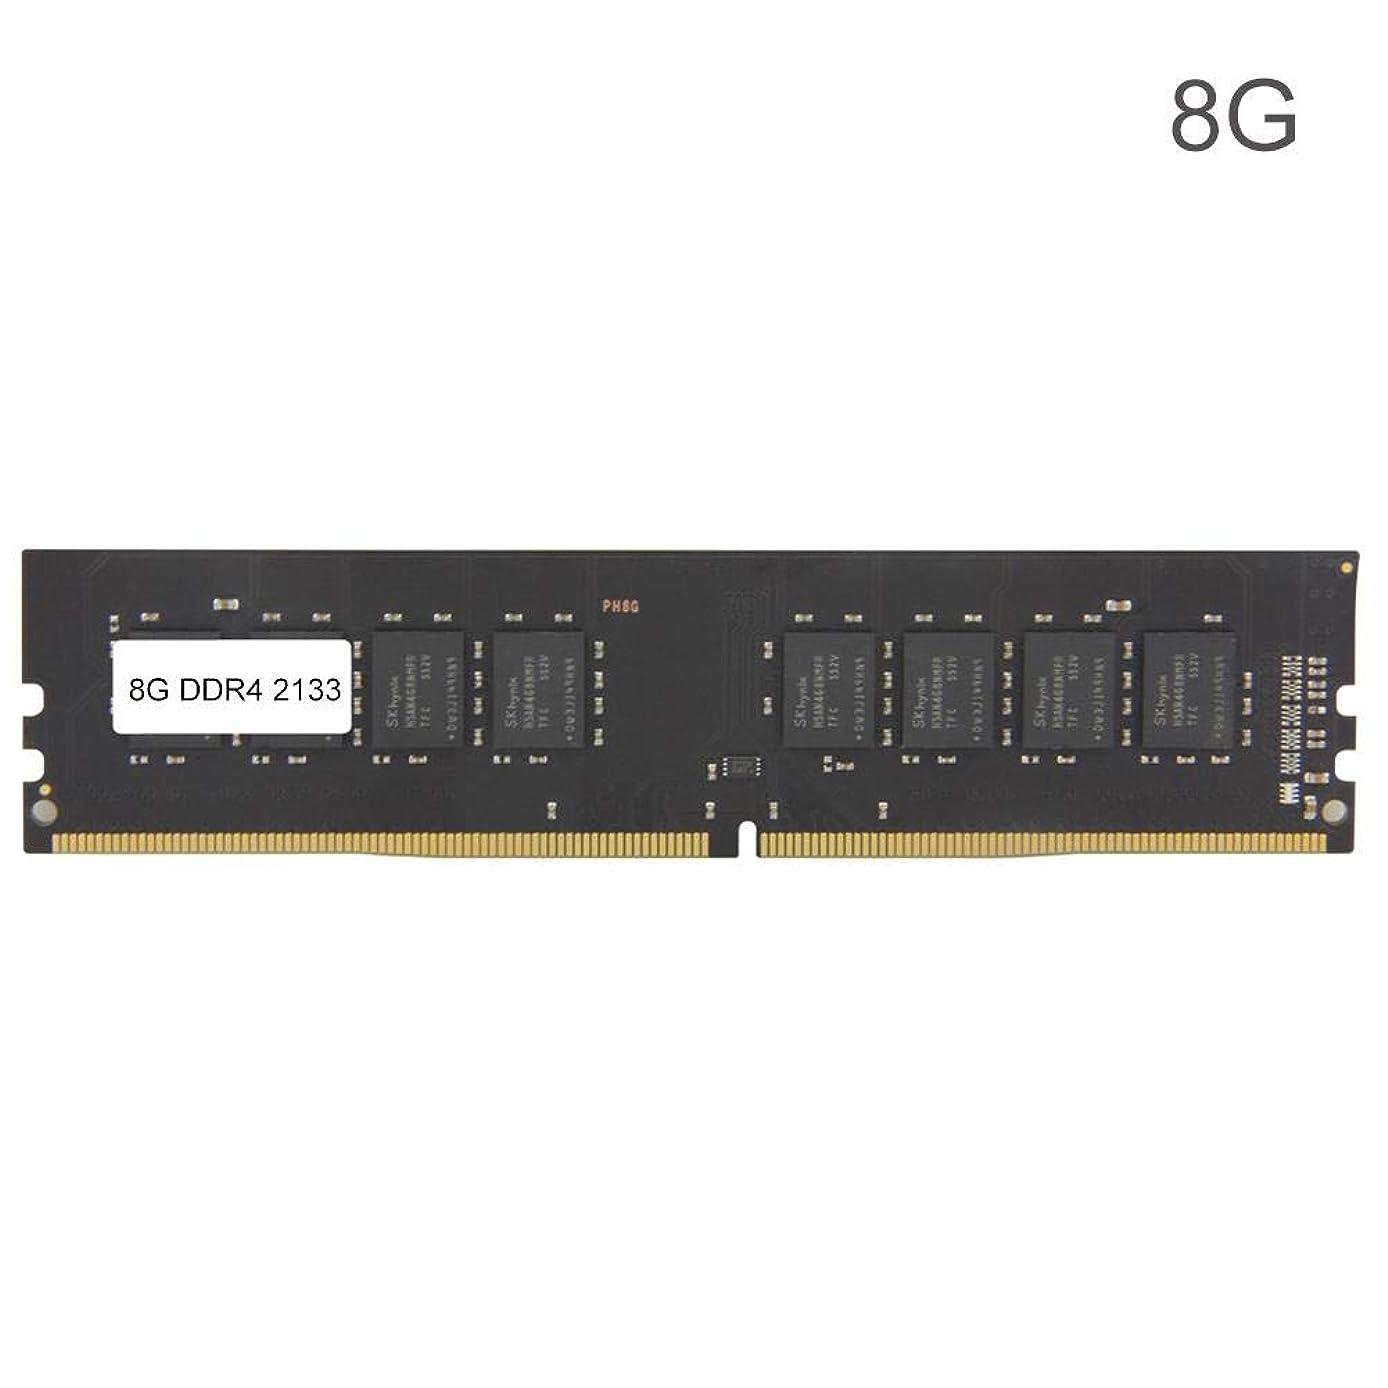 keruite Memoria RAM,DDR4 2133 4G/8G/16G PC4-17000 Computer Memory,1.2V Four Generations of Desktop Memory Modules